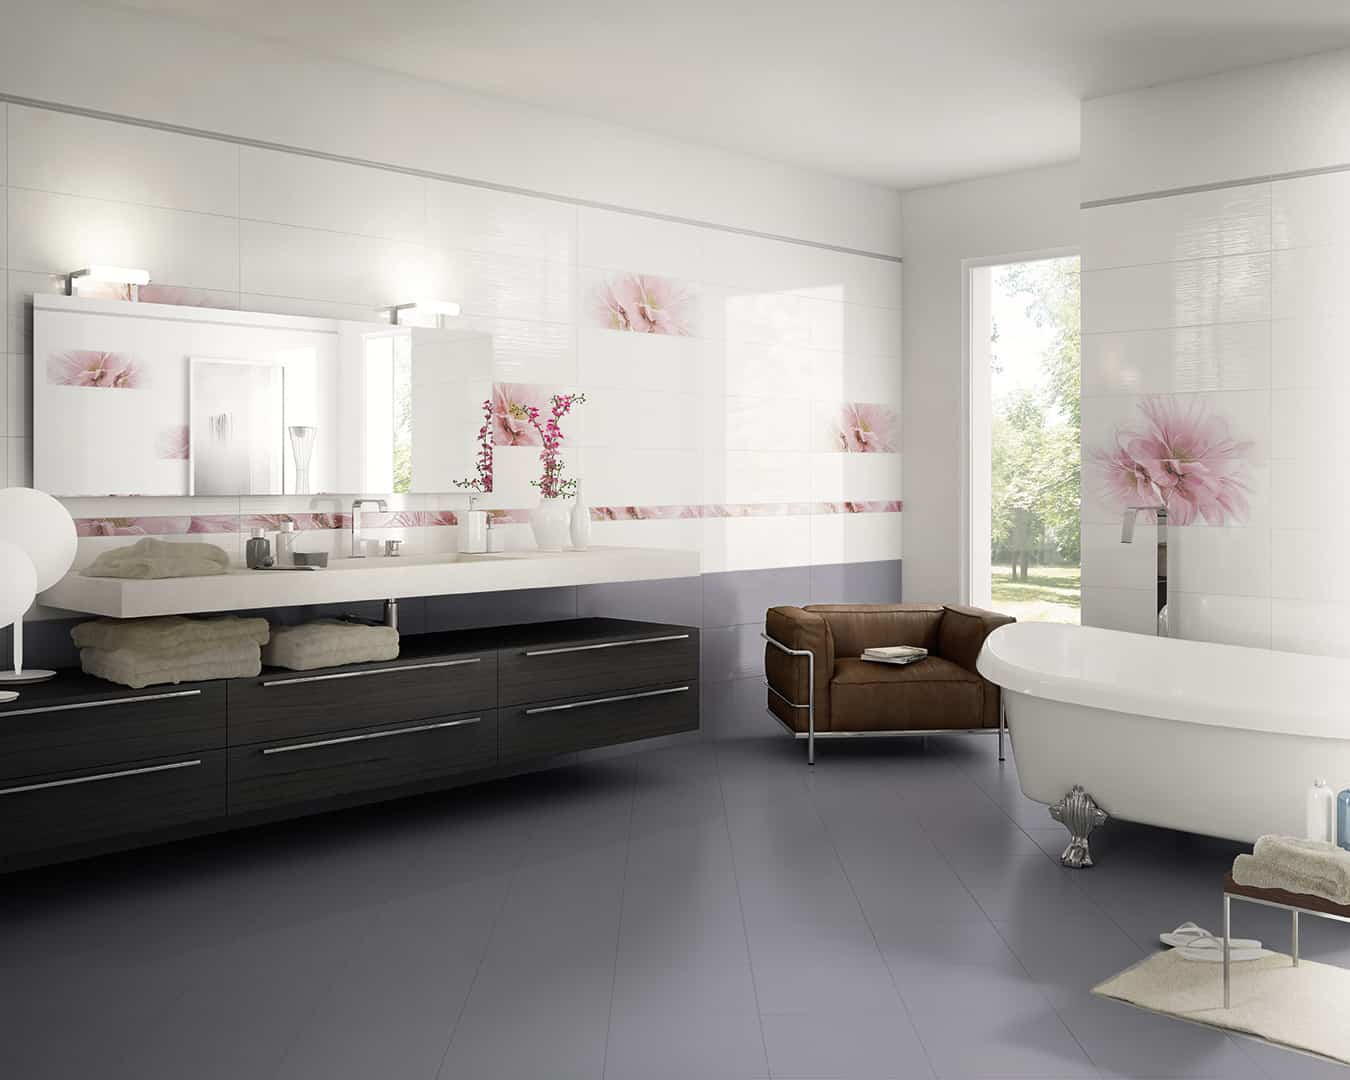 Tresor rivestimento bagno grigio wall musis ceramica - Rivestimento bagno grigio ...